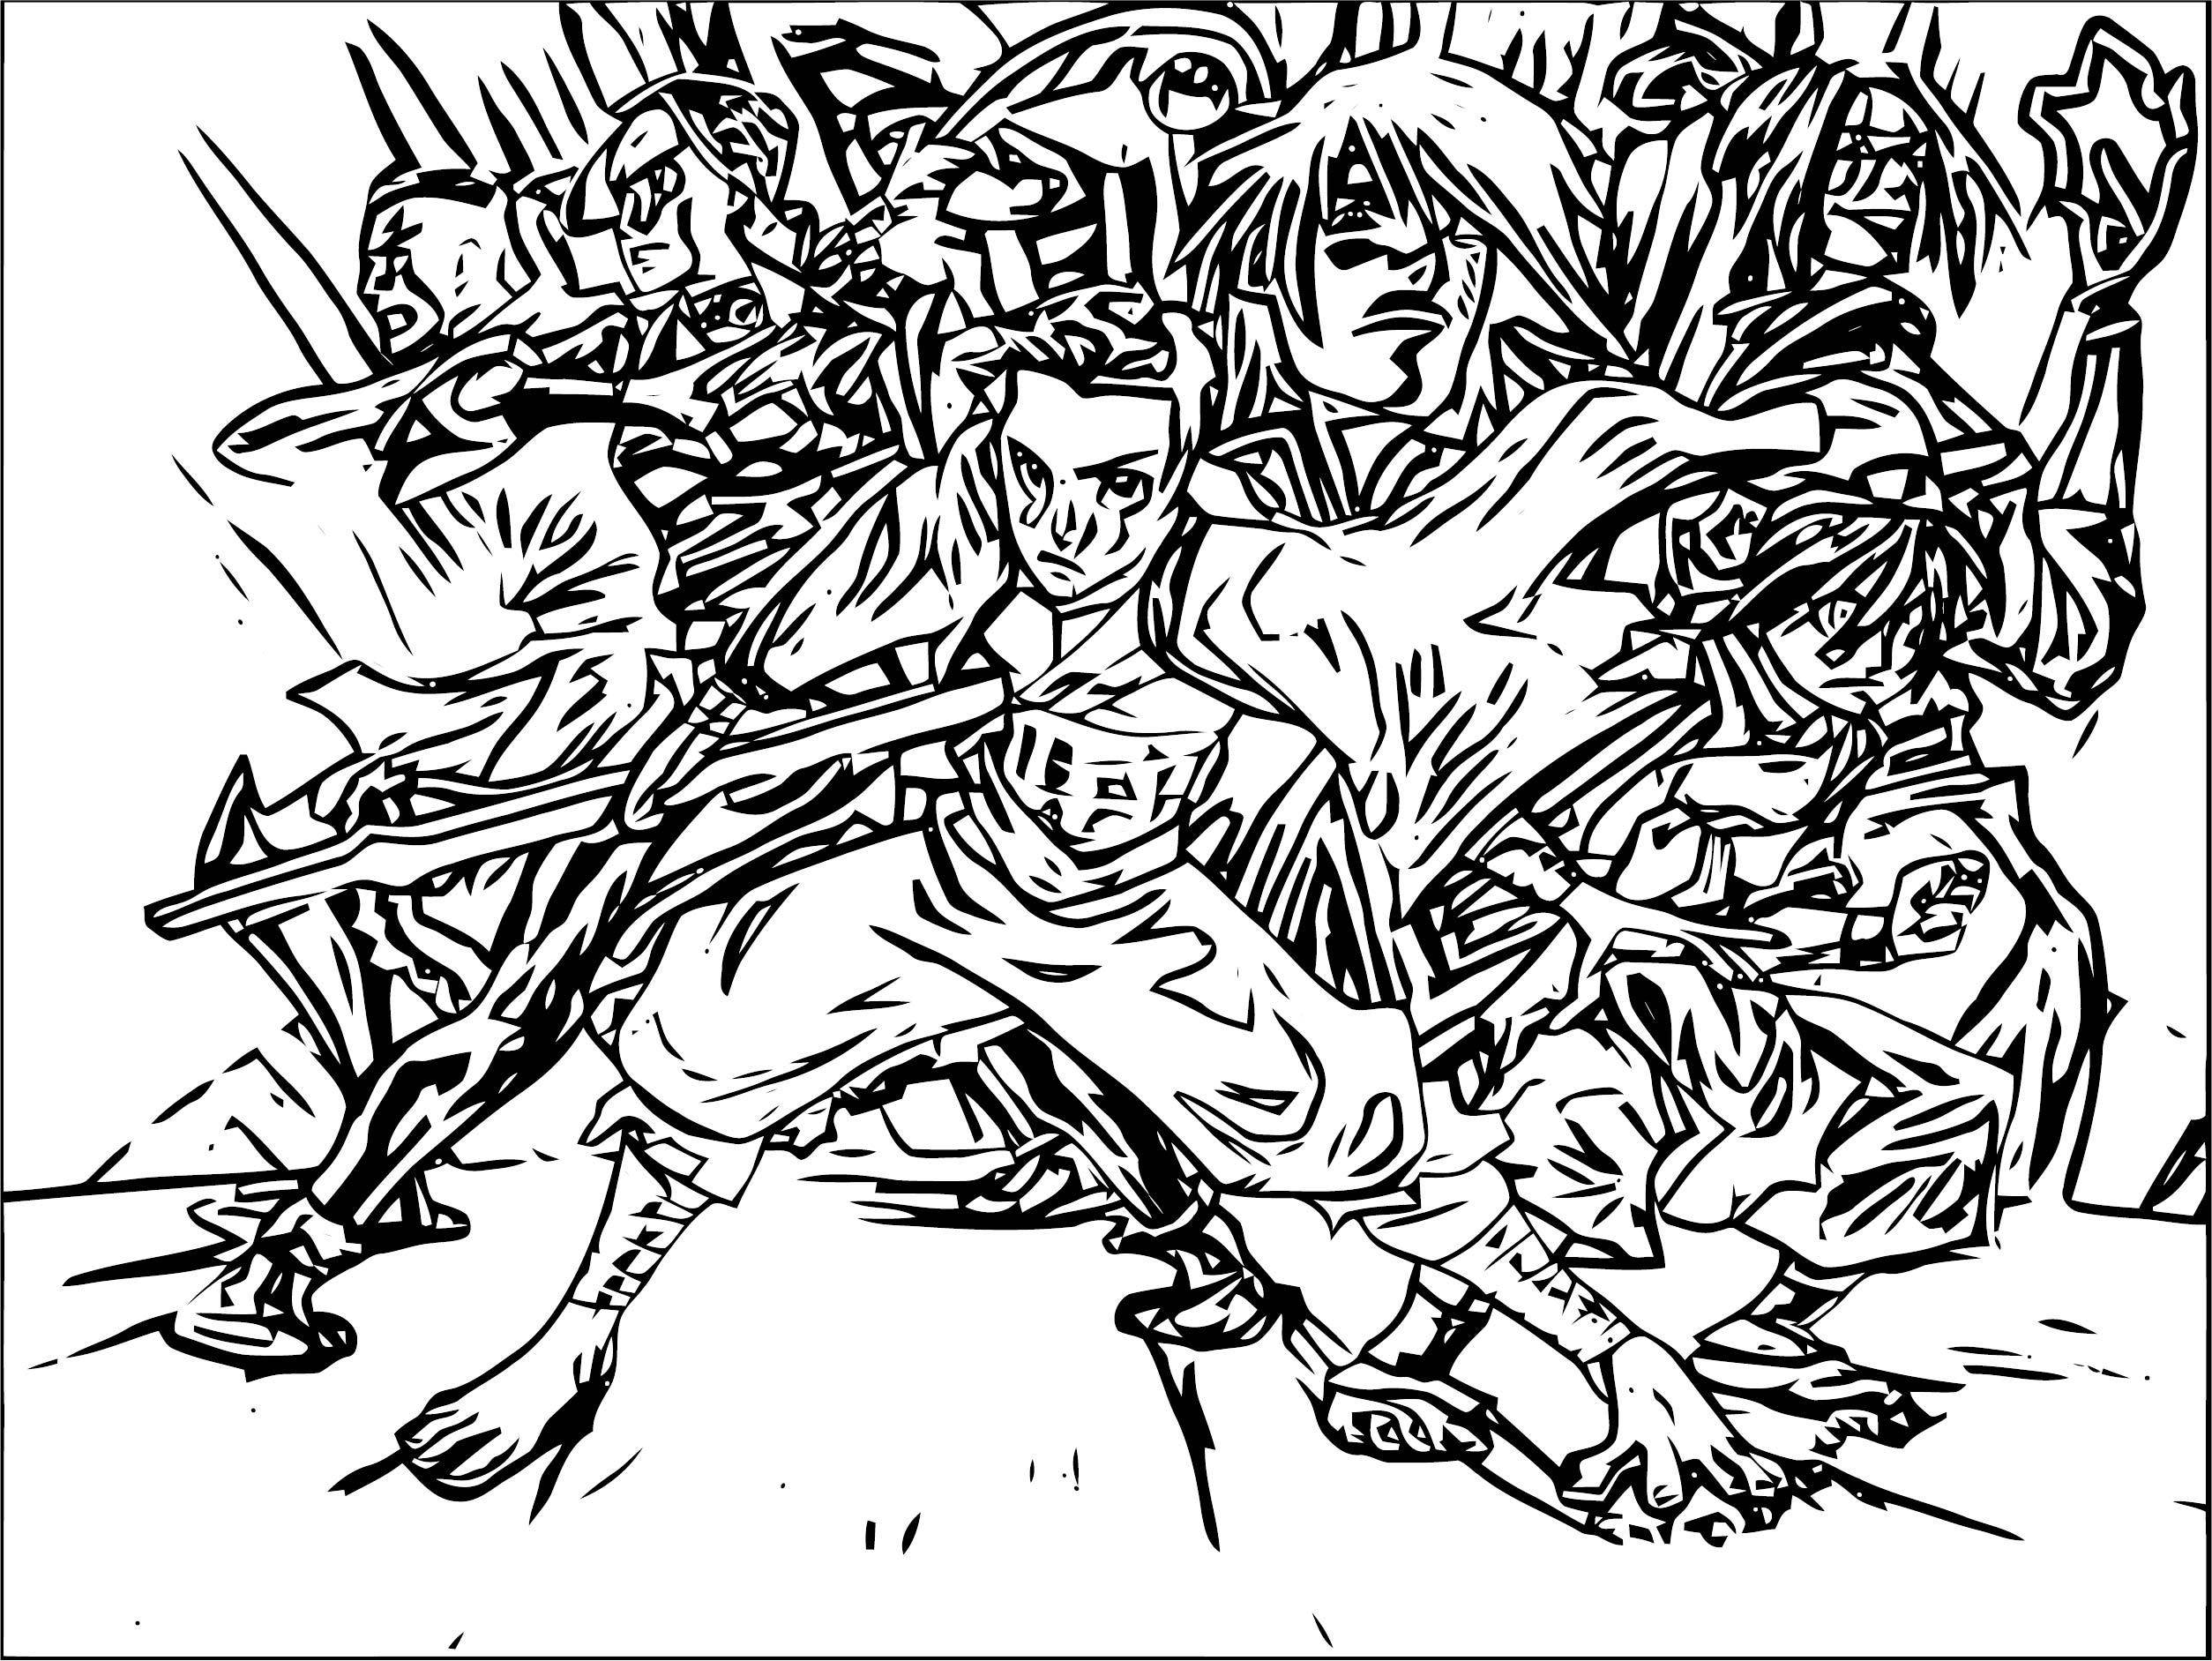 Avatar Aang Wallpaper Desktop Avatar Aang Coloring Page